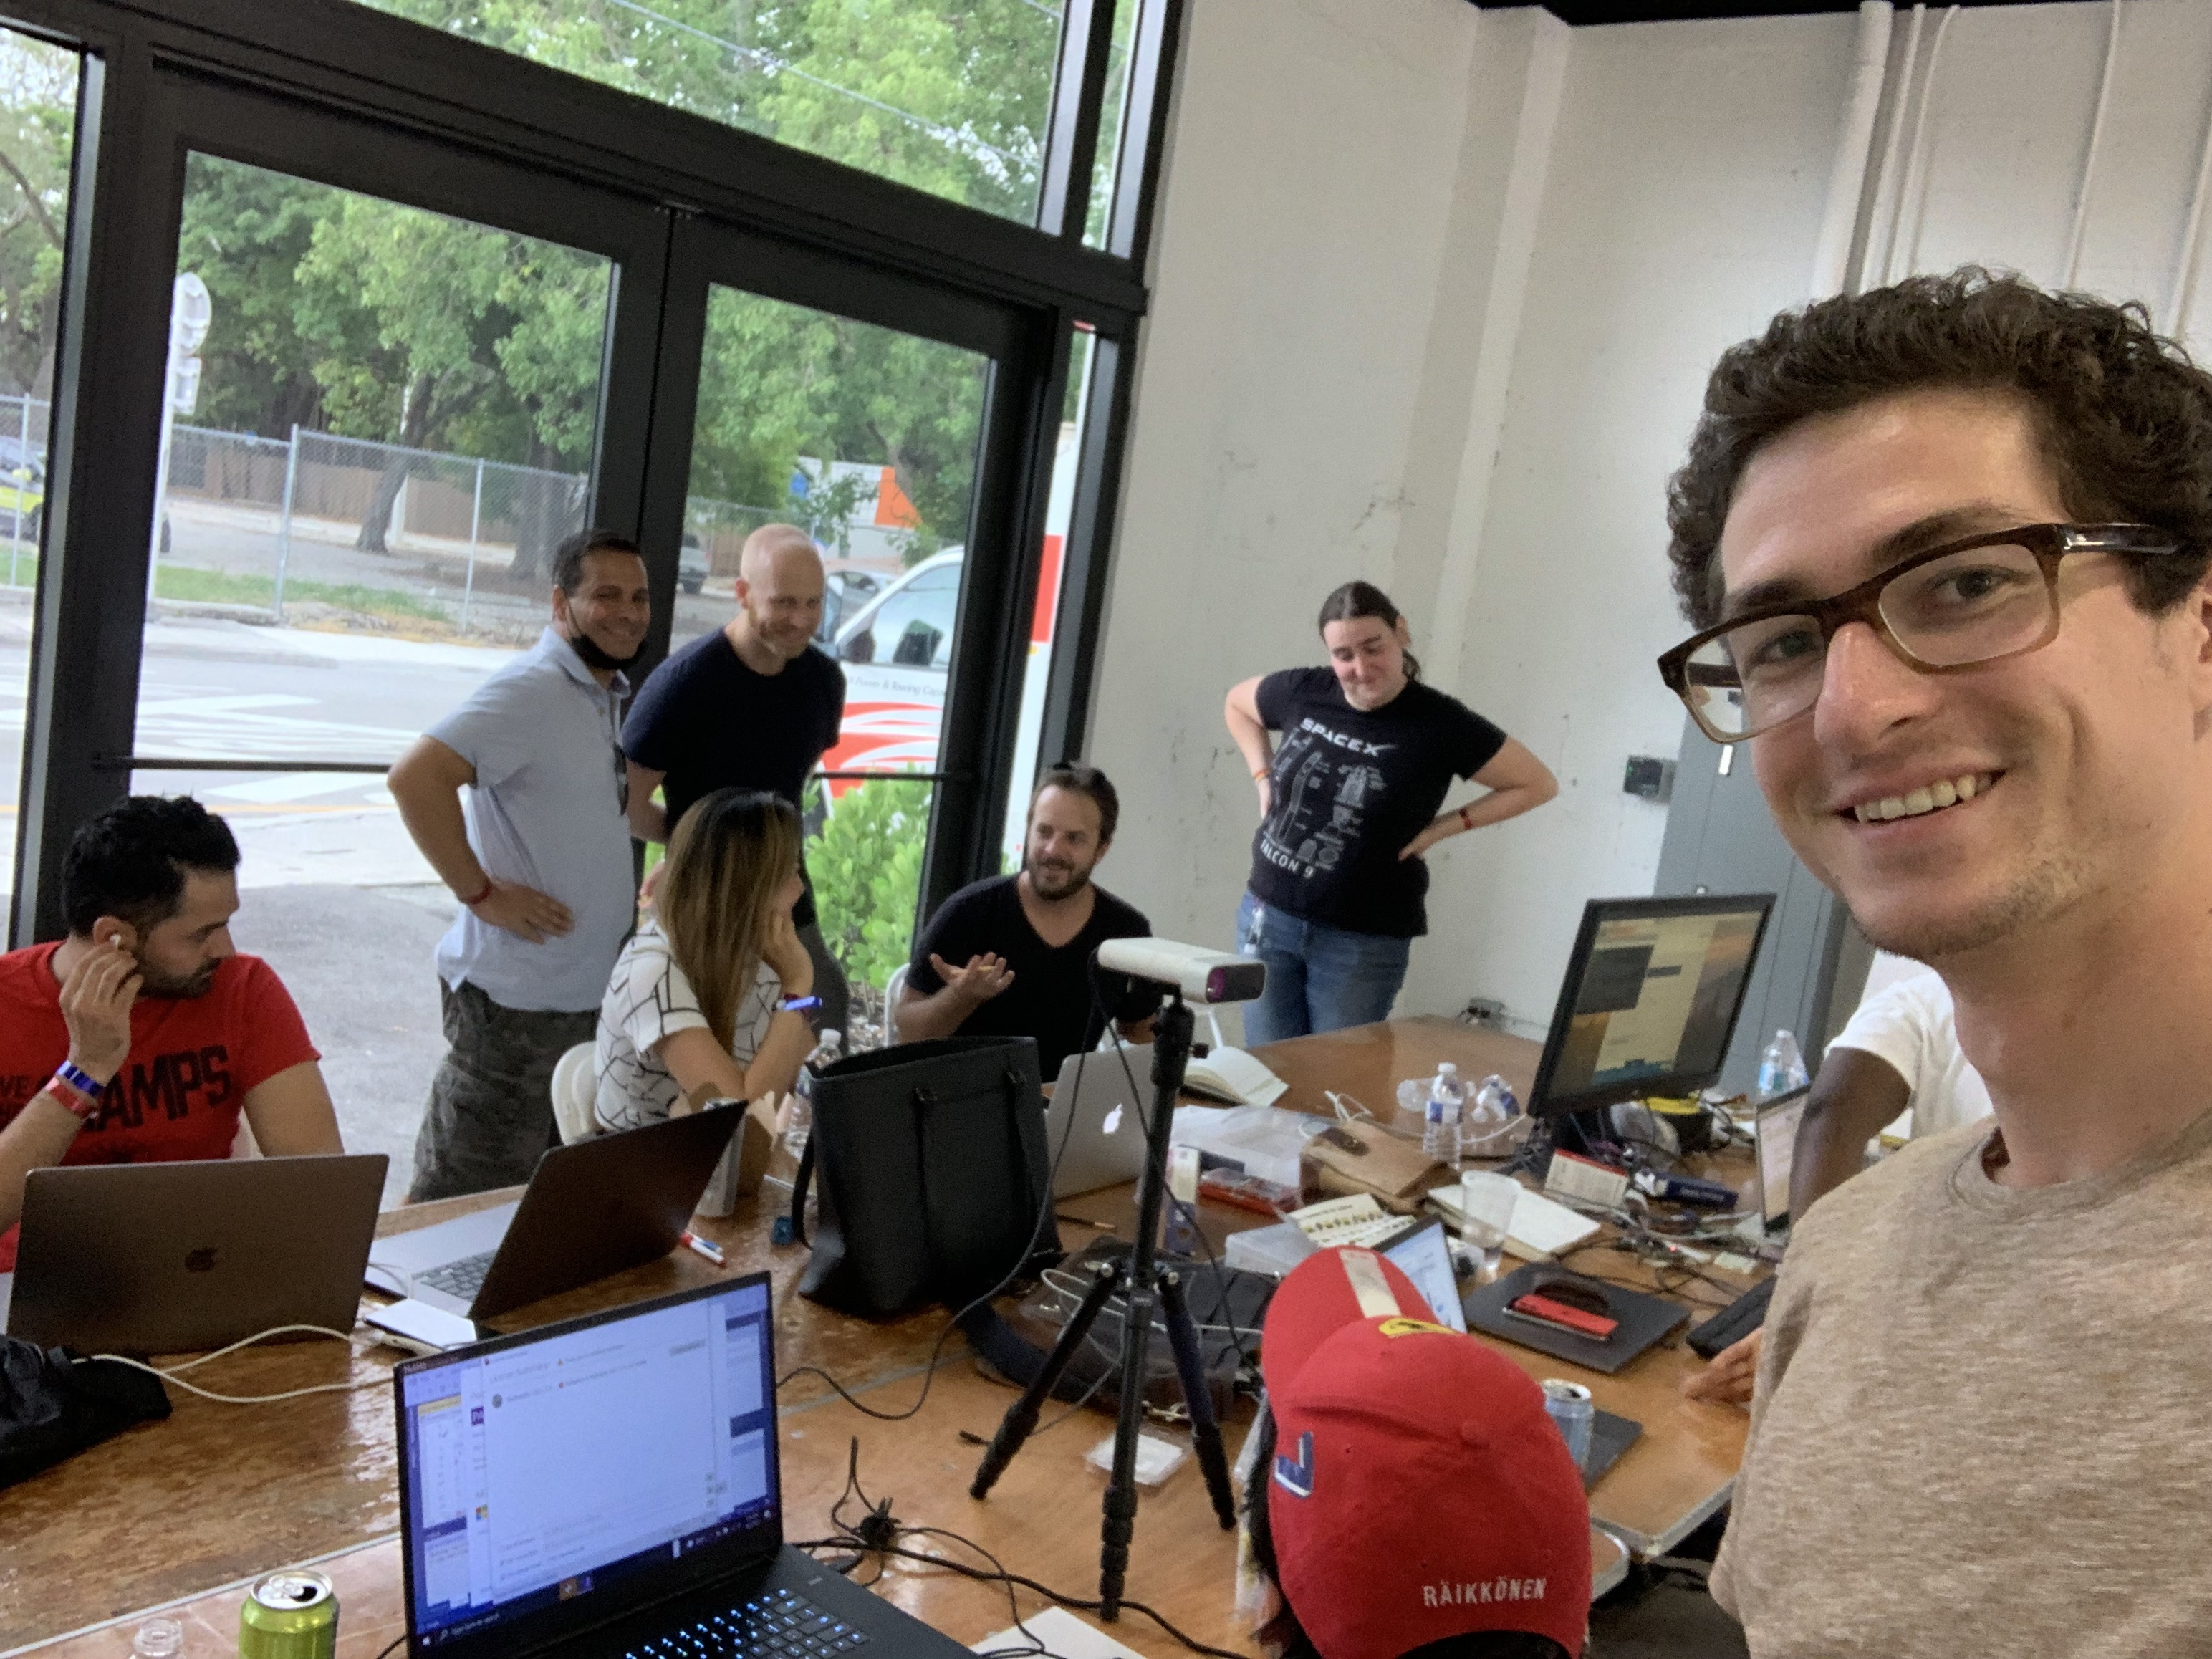 Hard Tech Miami members having fun building during Miami Hack Week